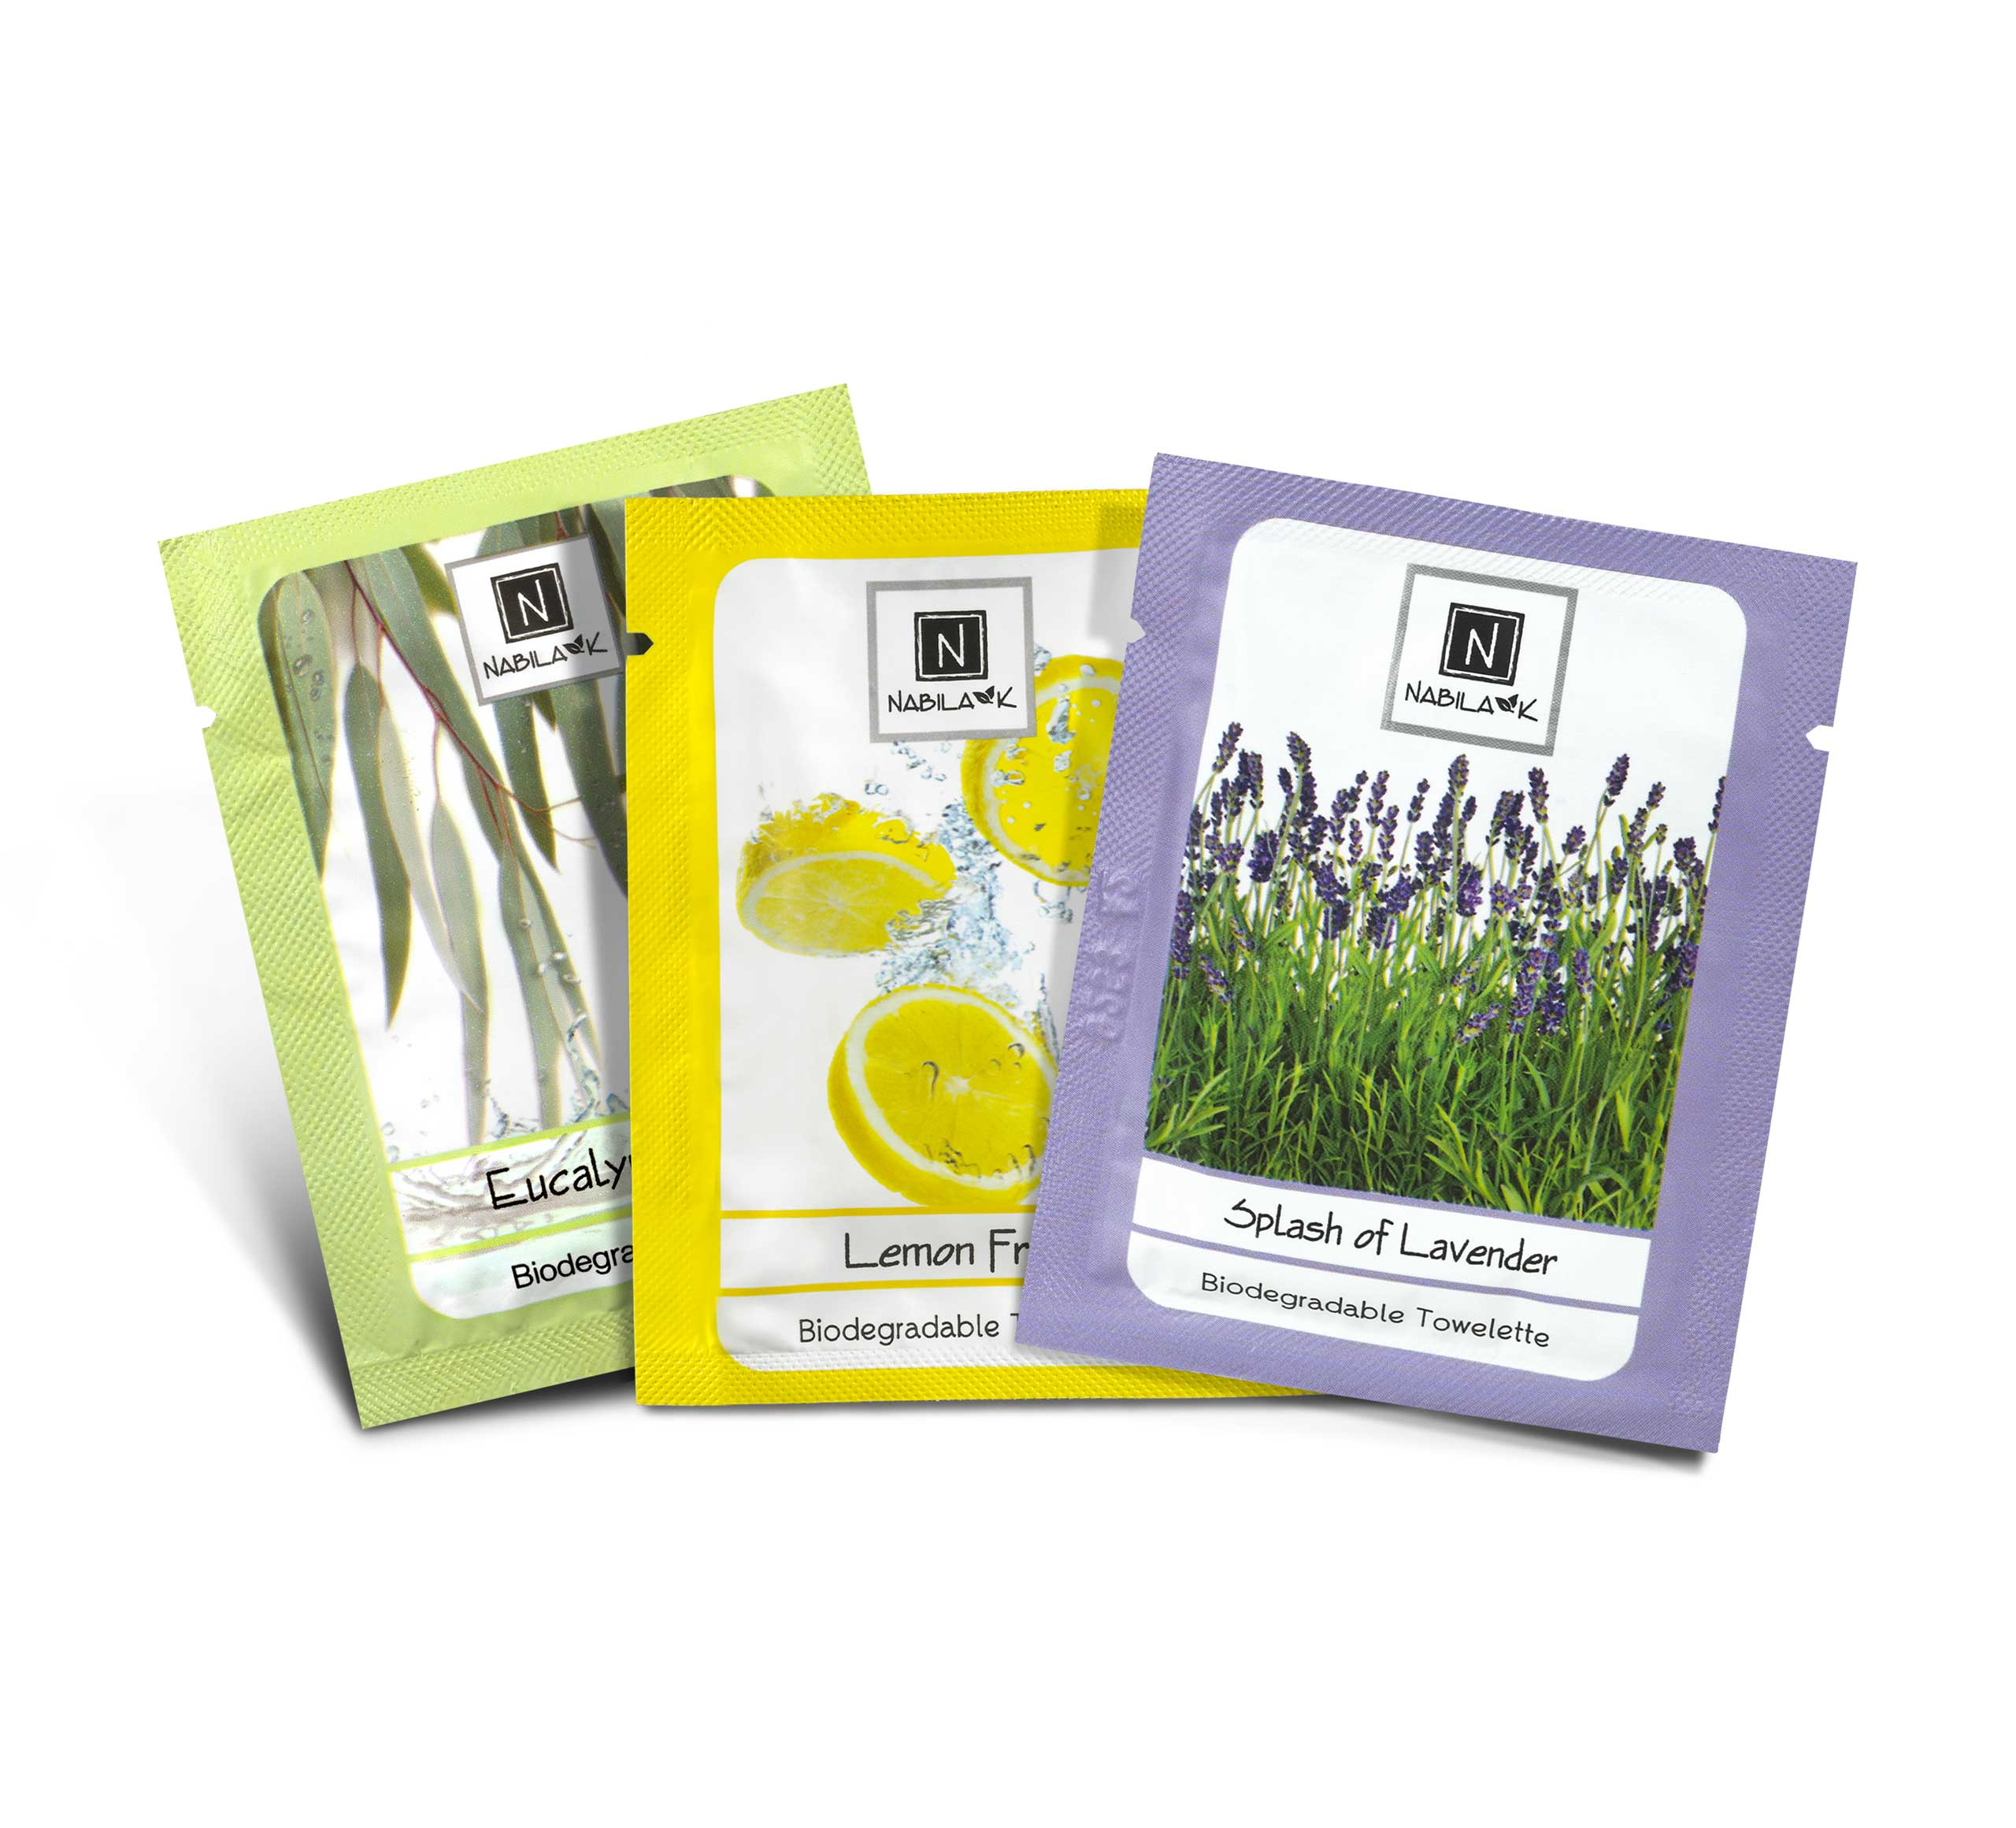 3 of Nabila K's Biodegradable Towelettes in Lavender, Lemon, Eucalyptus Scent